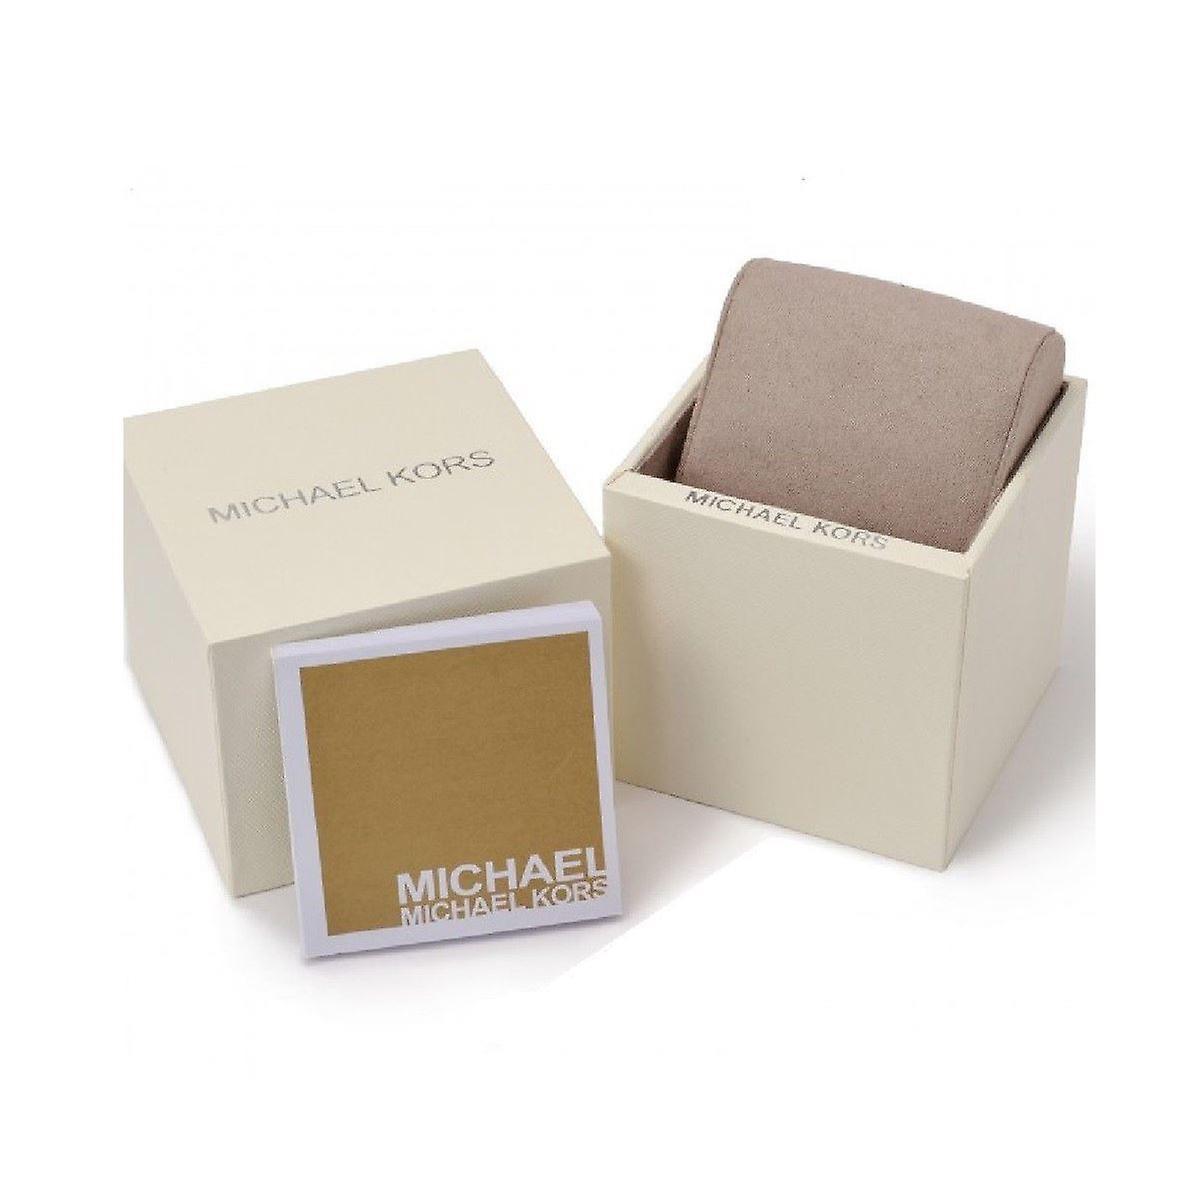 Michael Kors Callie Wrist Watch Stainless Steel Strap Silver Dial MK3342